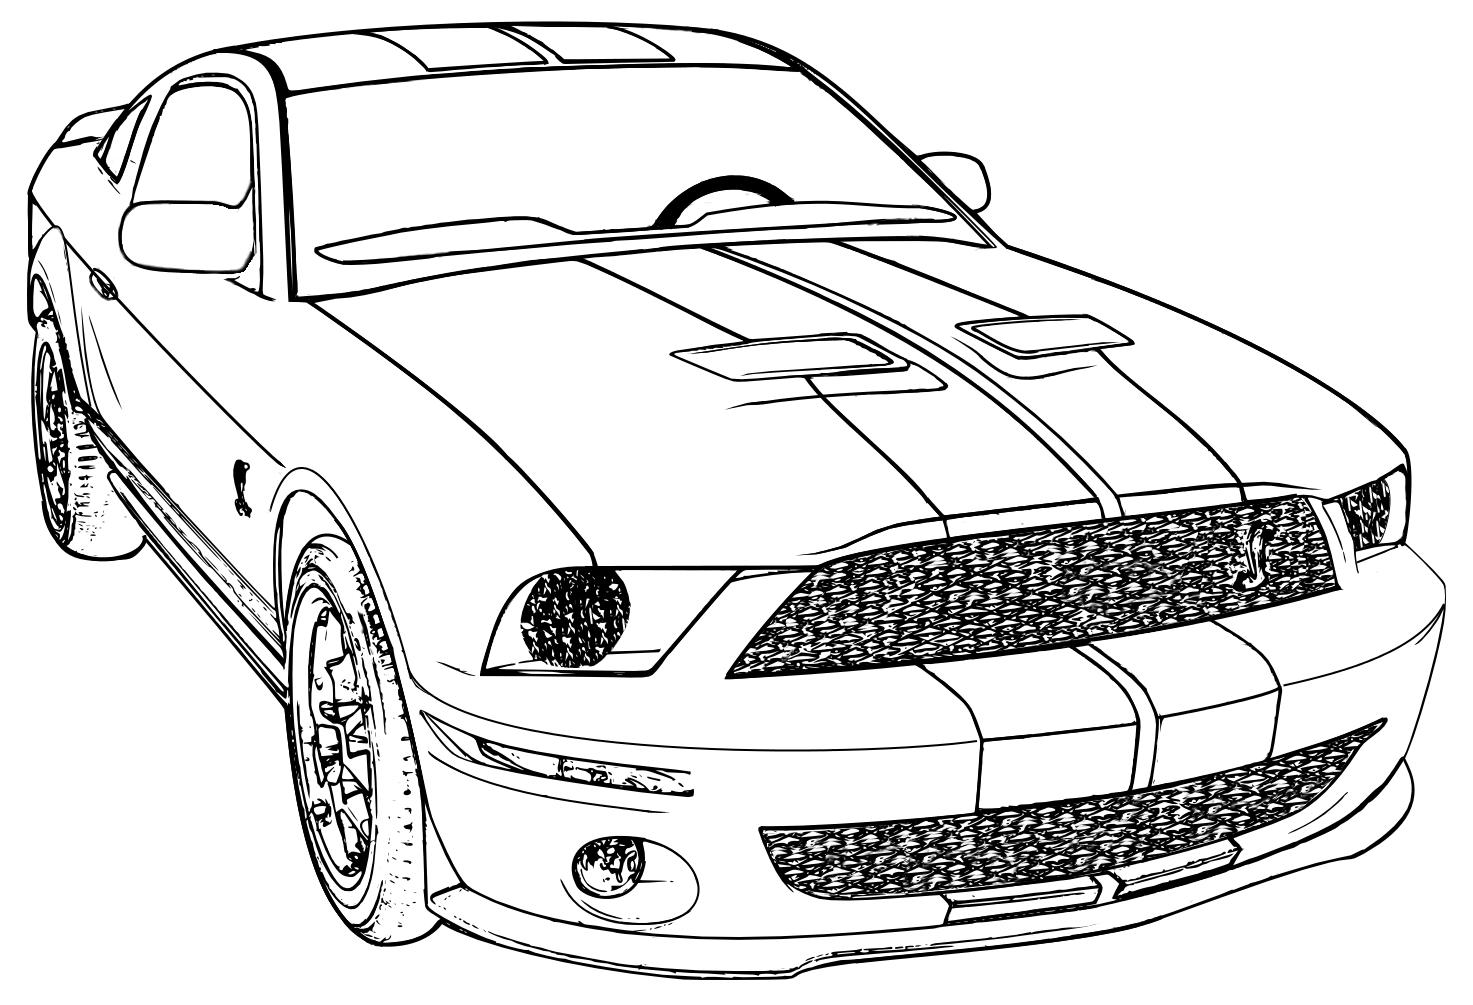 Gambar Boboiboy Menjadi 6 Auto Electrical Wiring Diagram